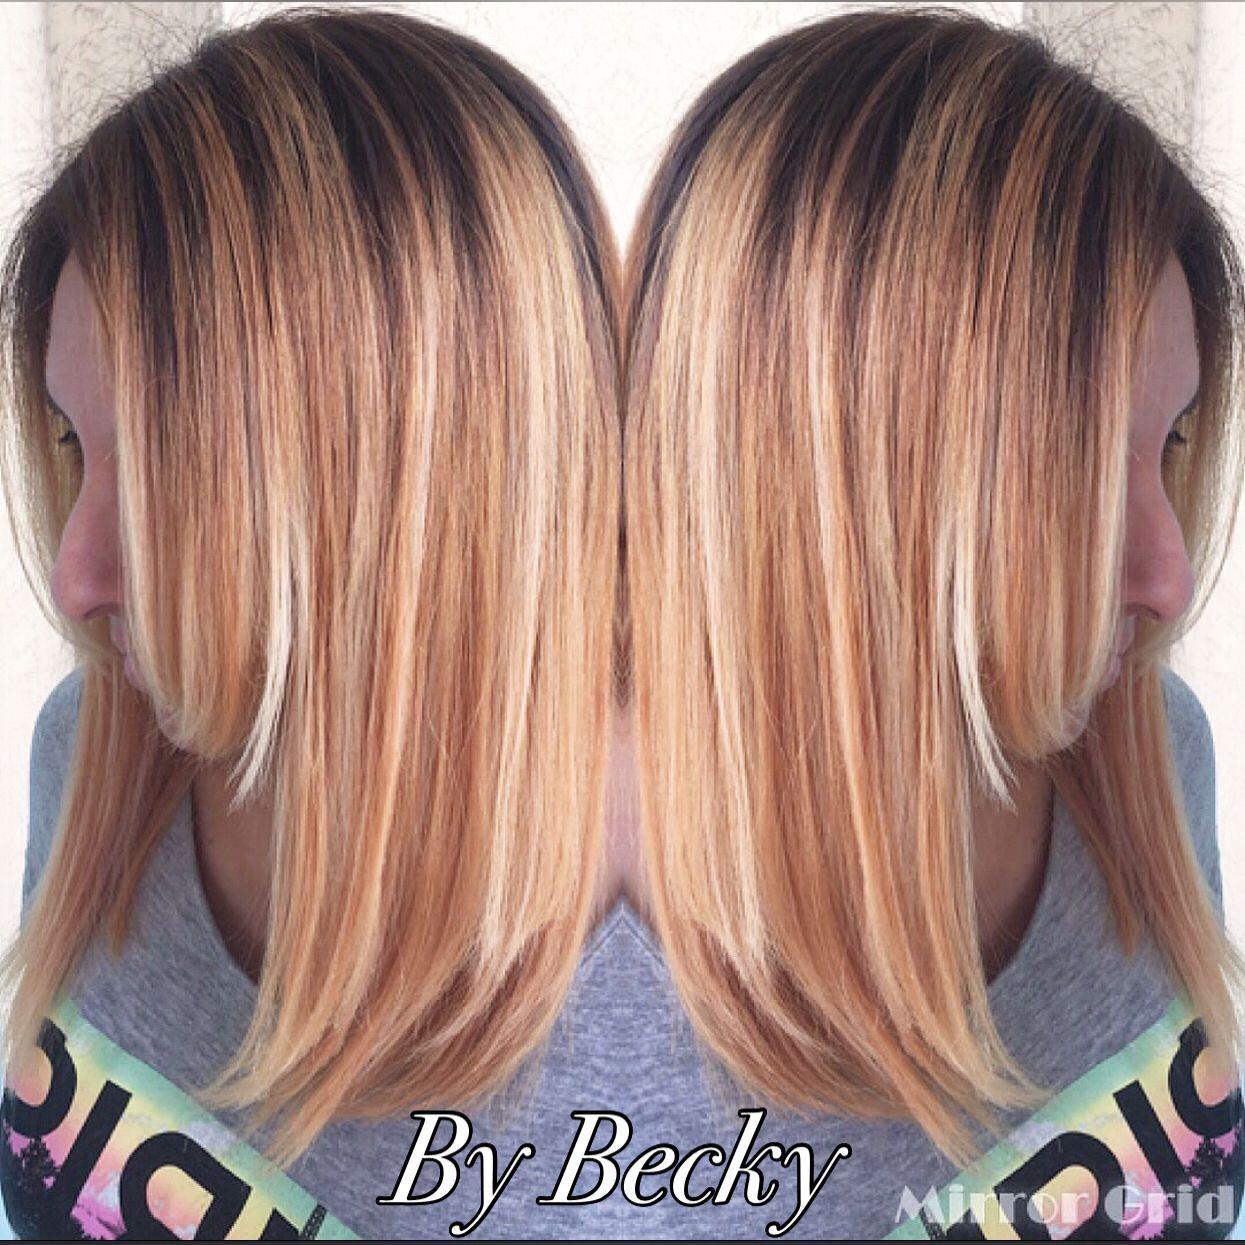 Ombré u long bob haircut trendy hair colors pinterest long bob